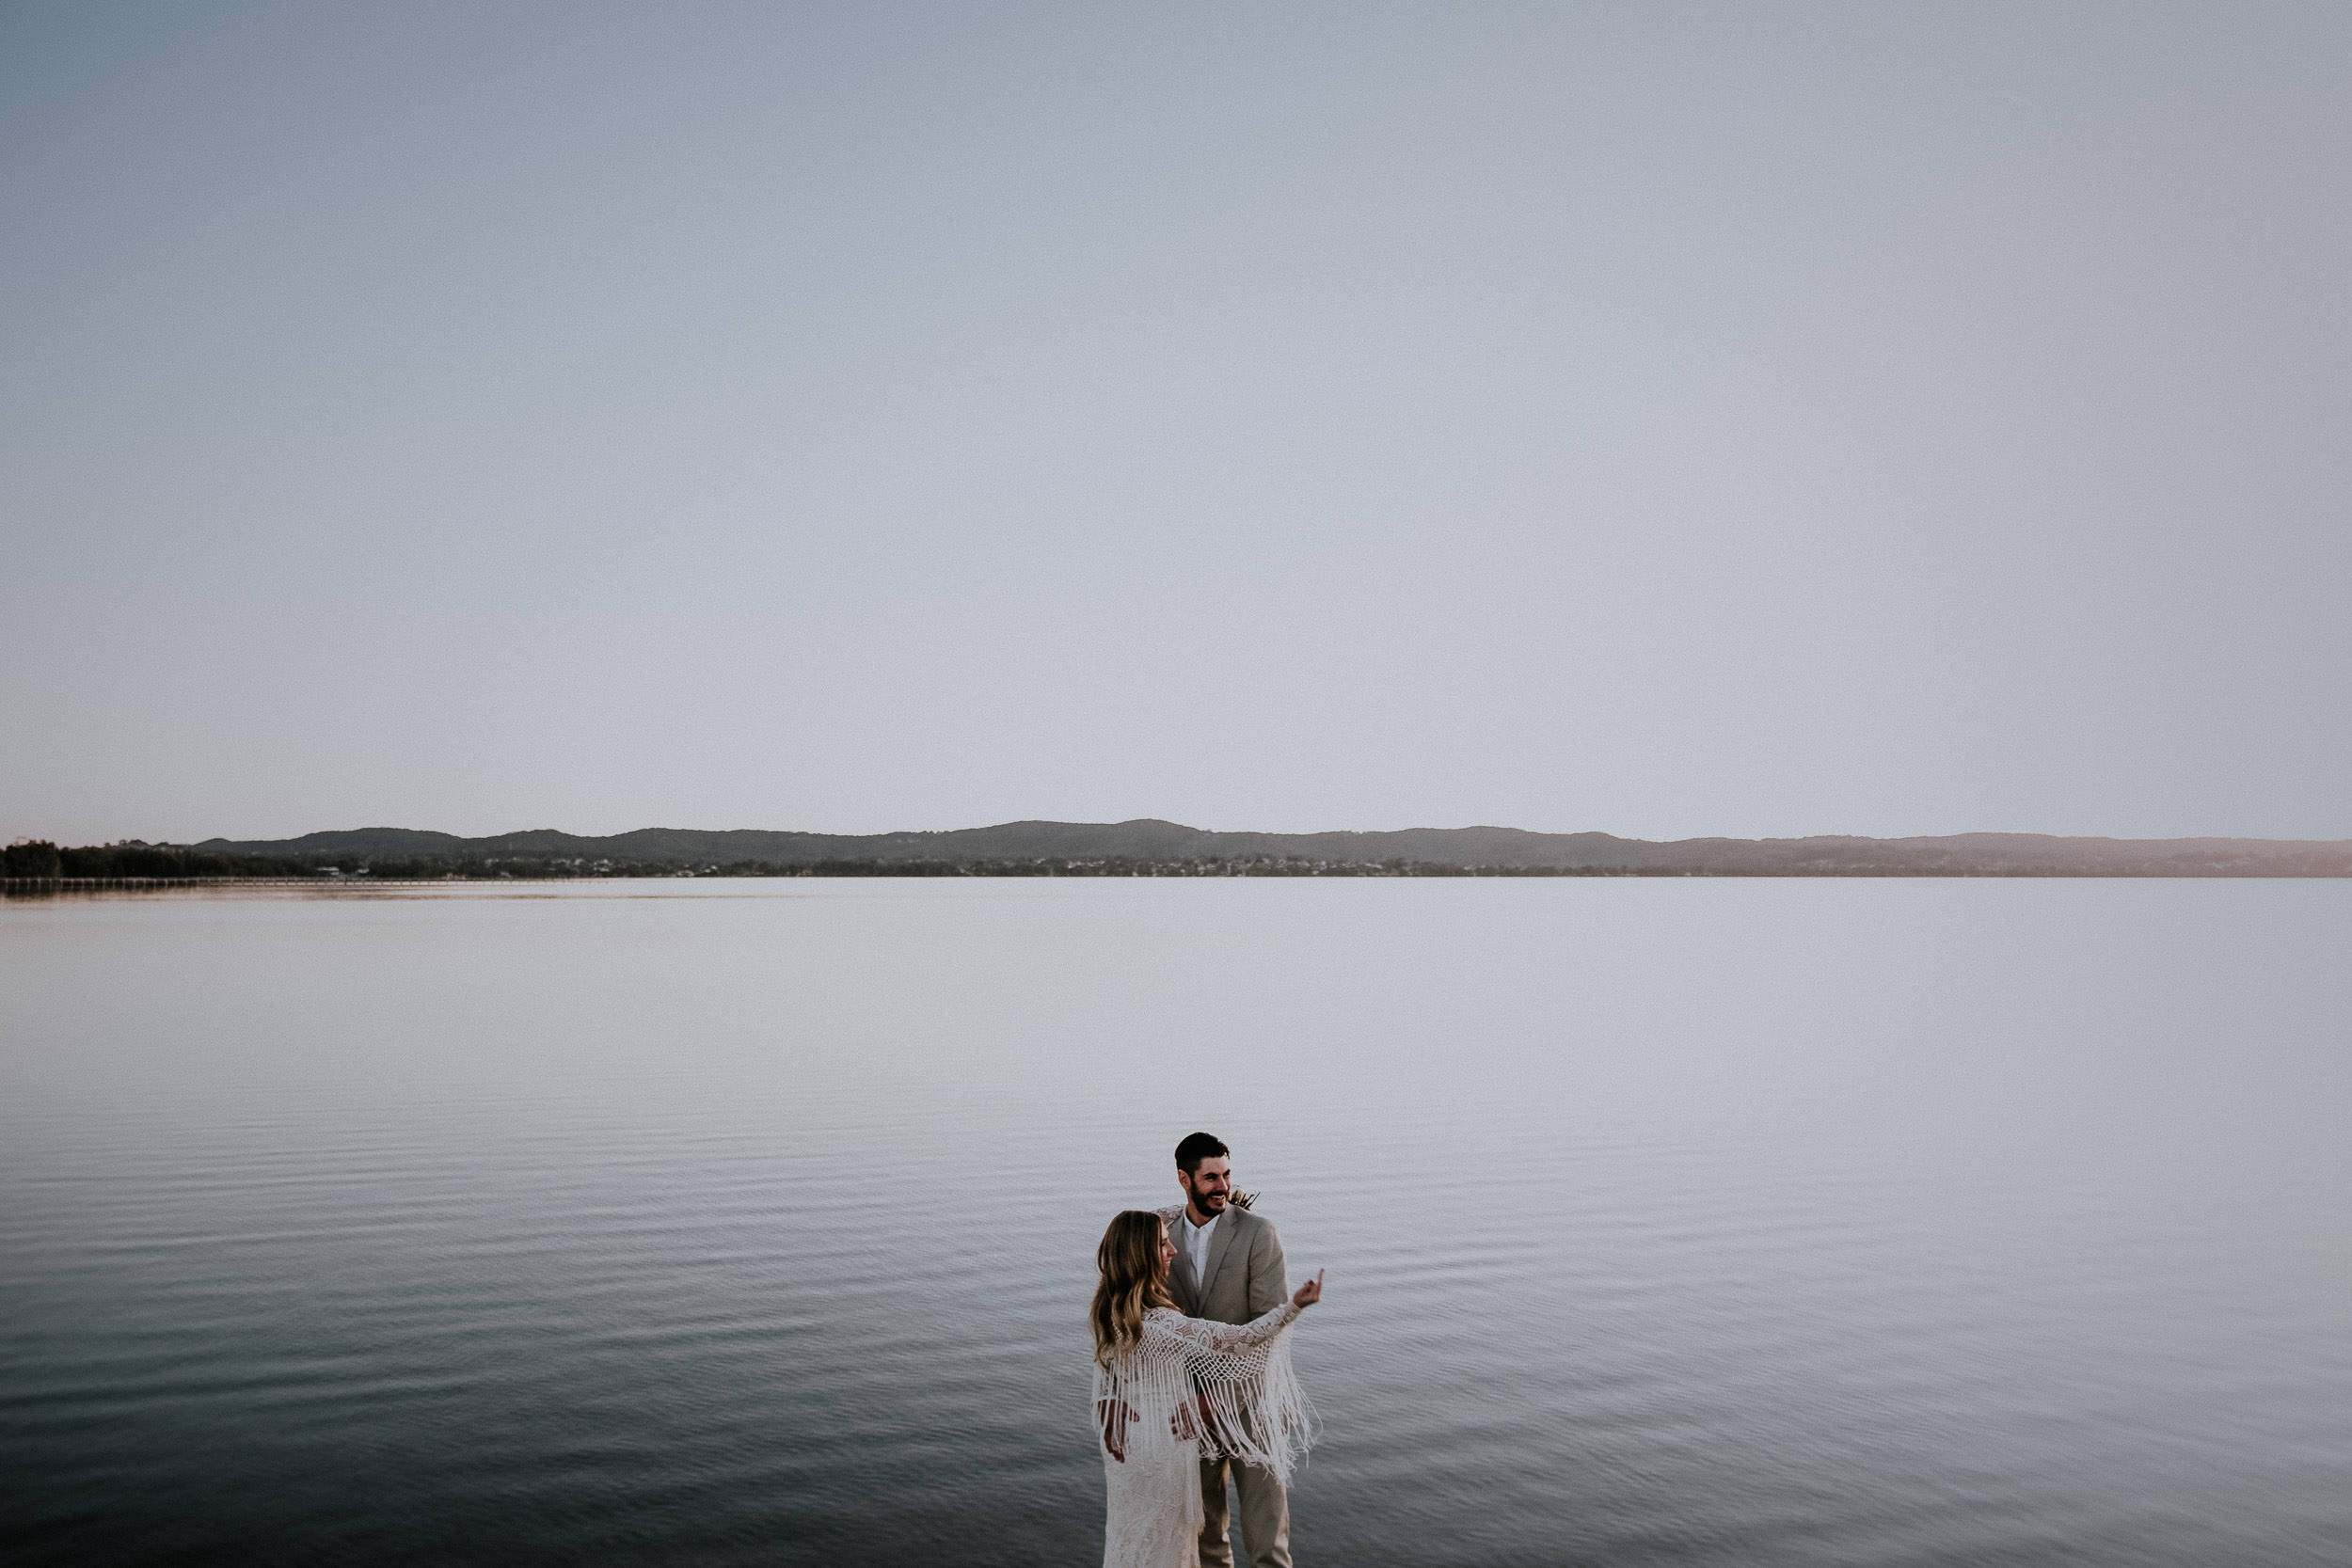 S&A Elopement - Kings & Thieves - Shred 'Til Dead - Central Coast Beach Forest Wedding - 393.jpg